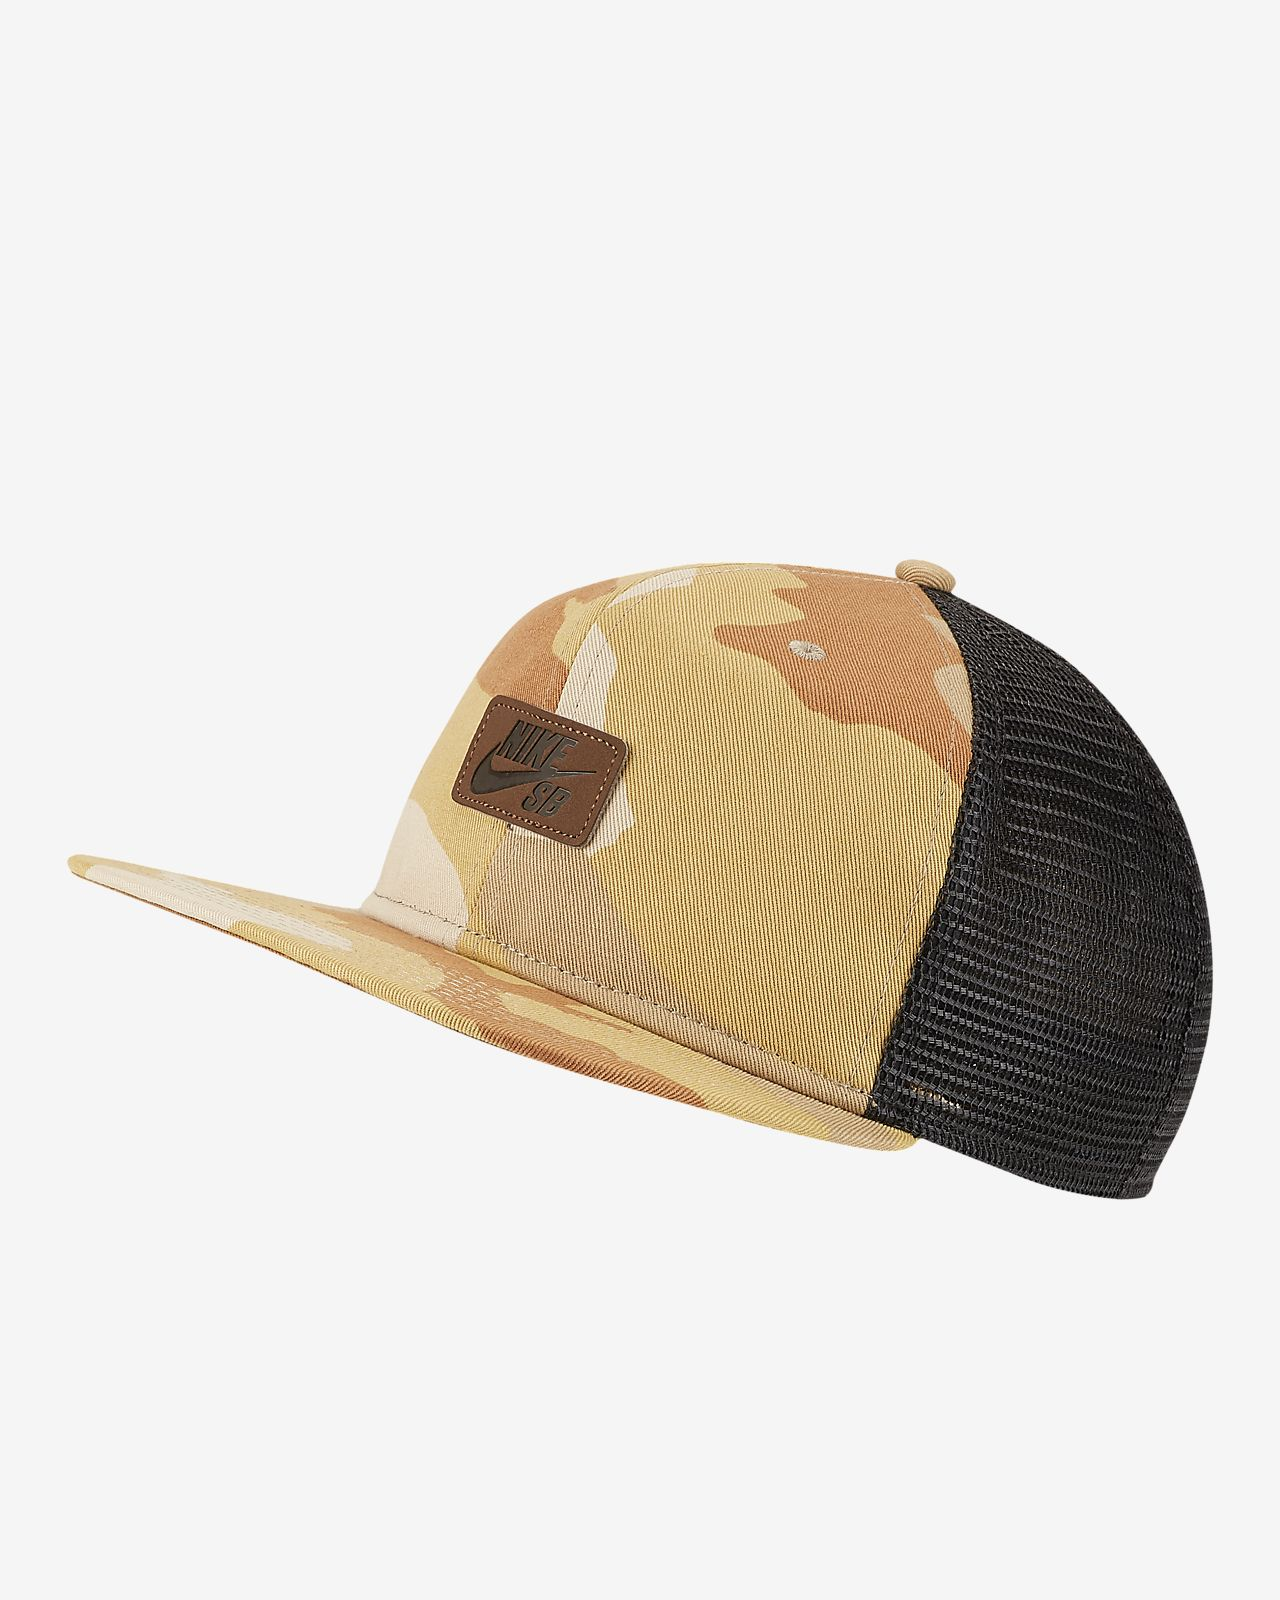 premium selection 957f7 092f9 ... Nike SB Skate Trucker Hat